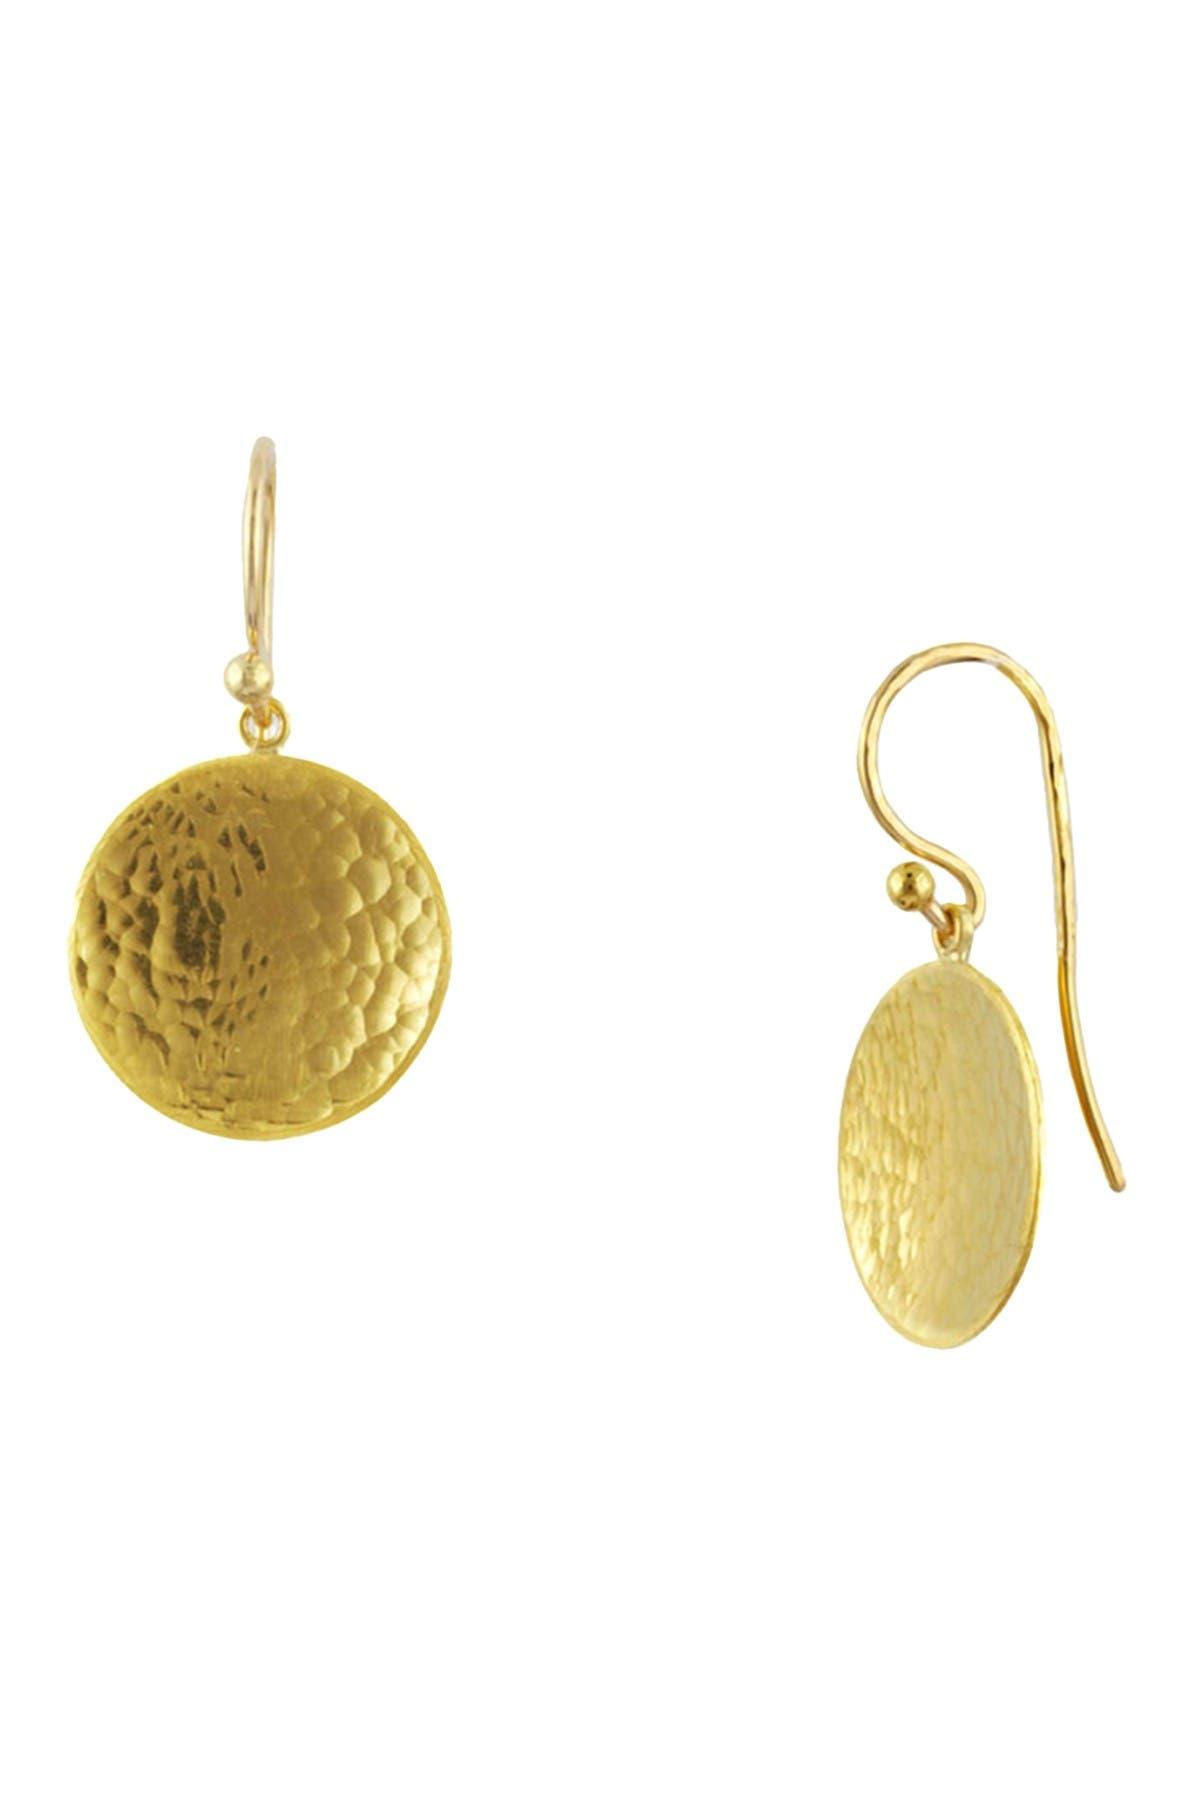 Image of Gurhan 24K Gold Hammered Drop Earrings